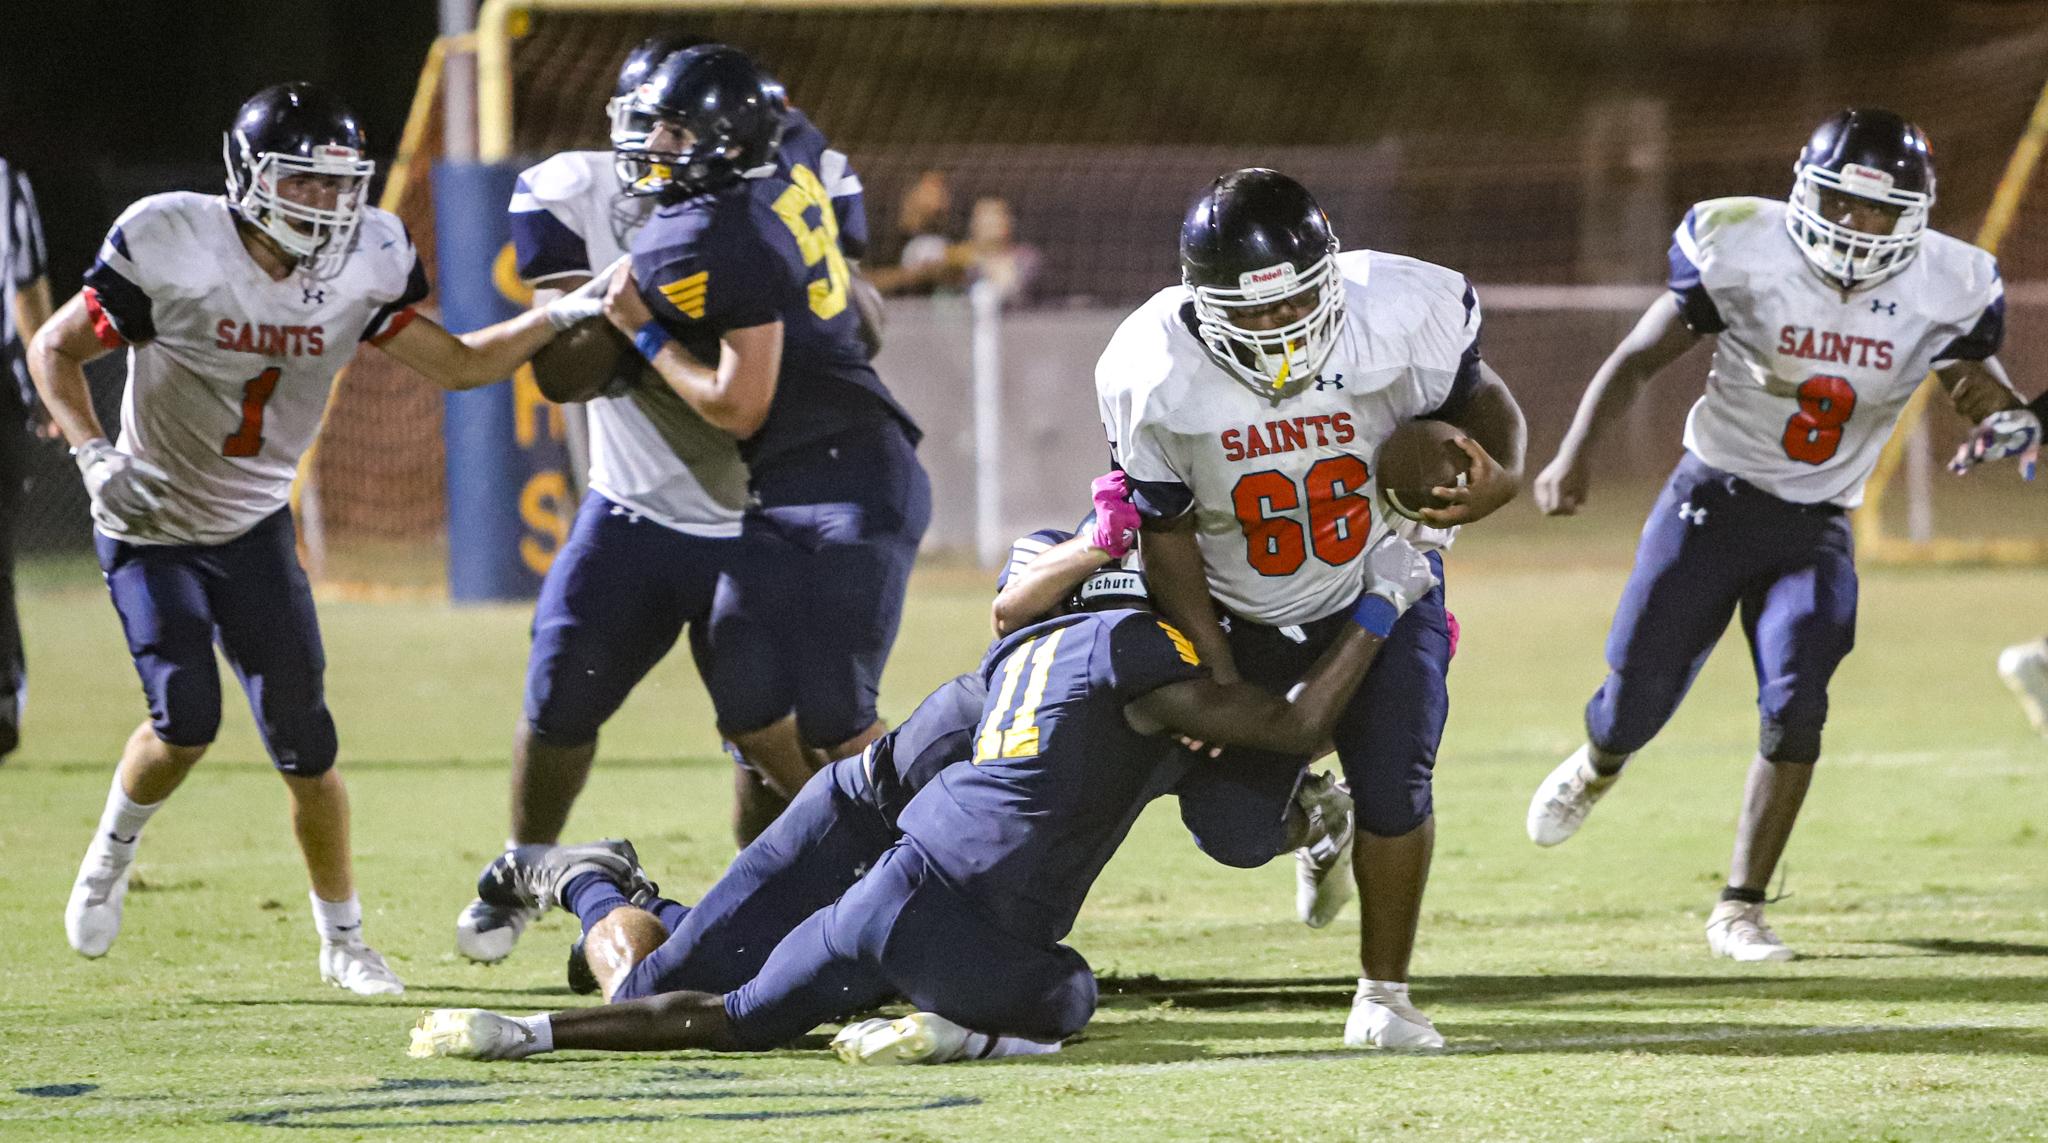 Football: Southern Wayne Topples Goldsboro, Ends Long Skid On Gridiron (PHOTO GALLERY)